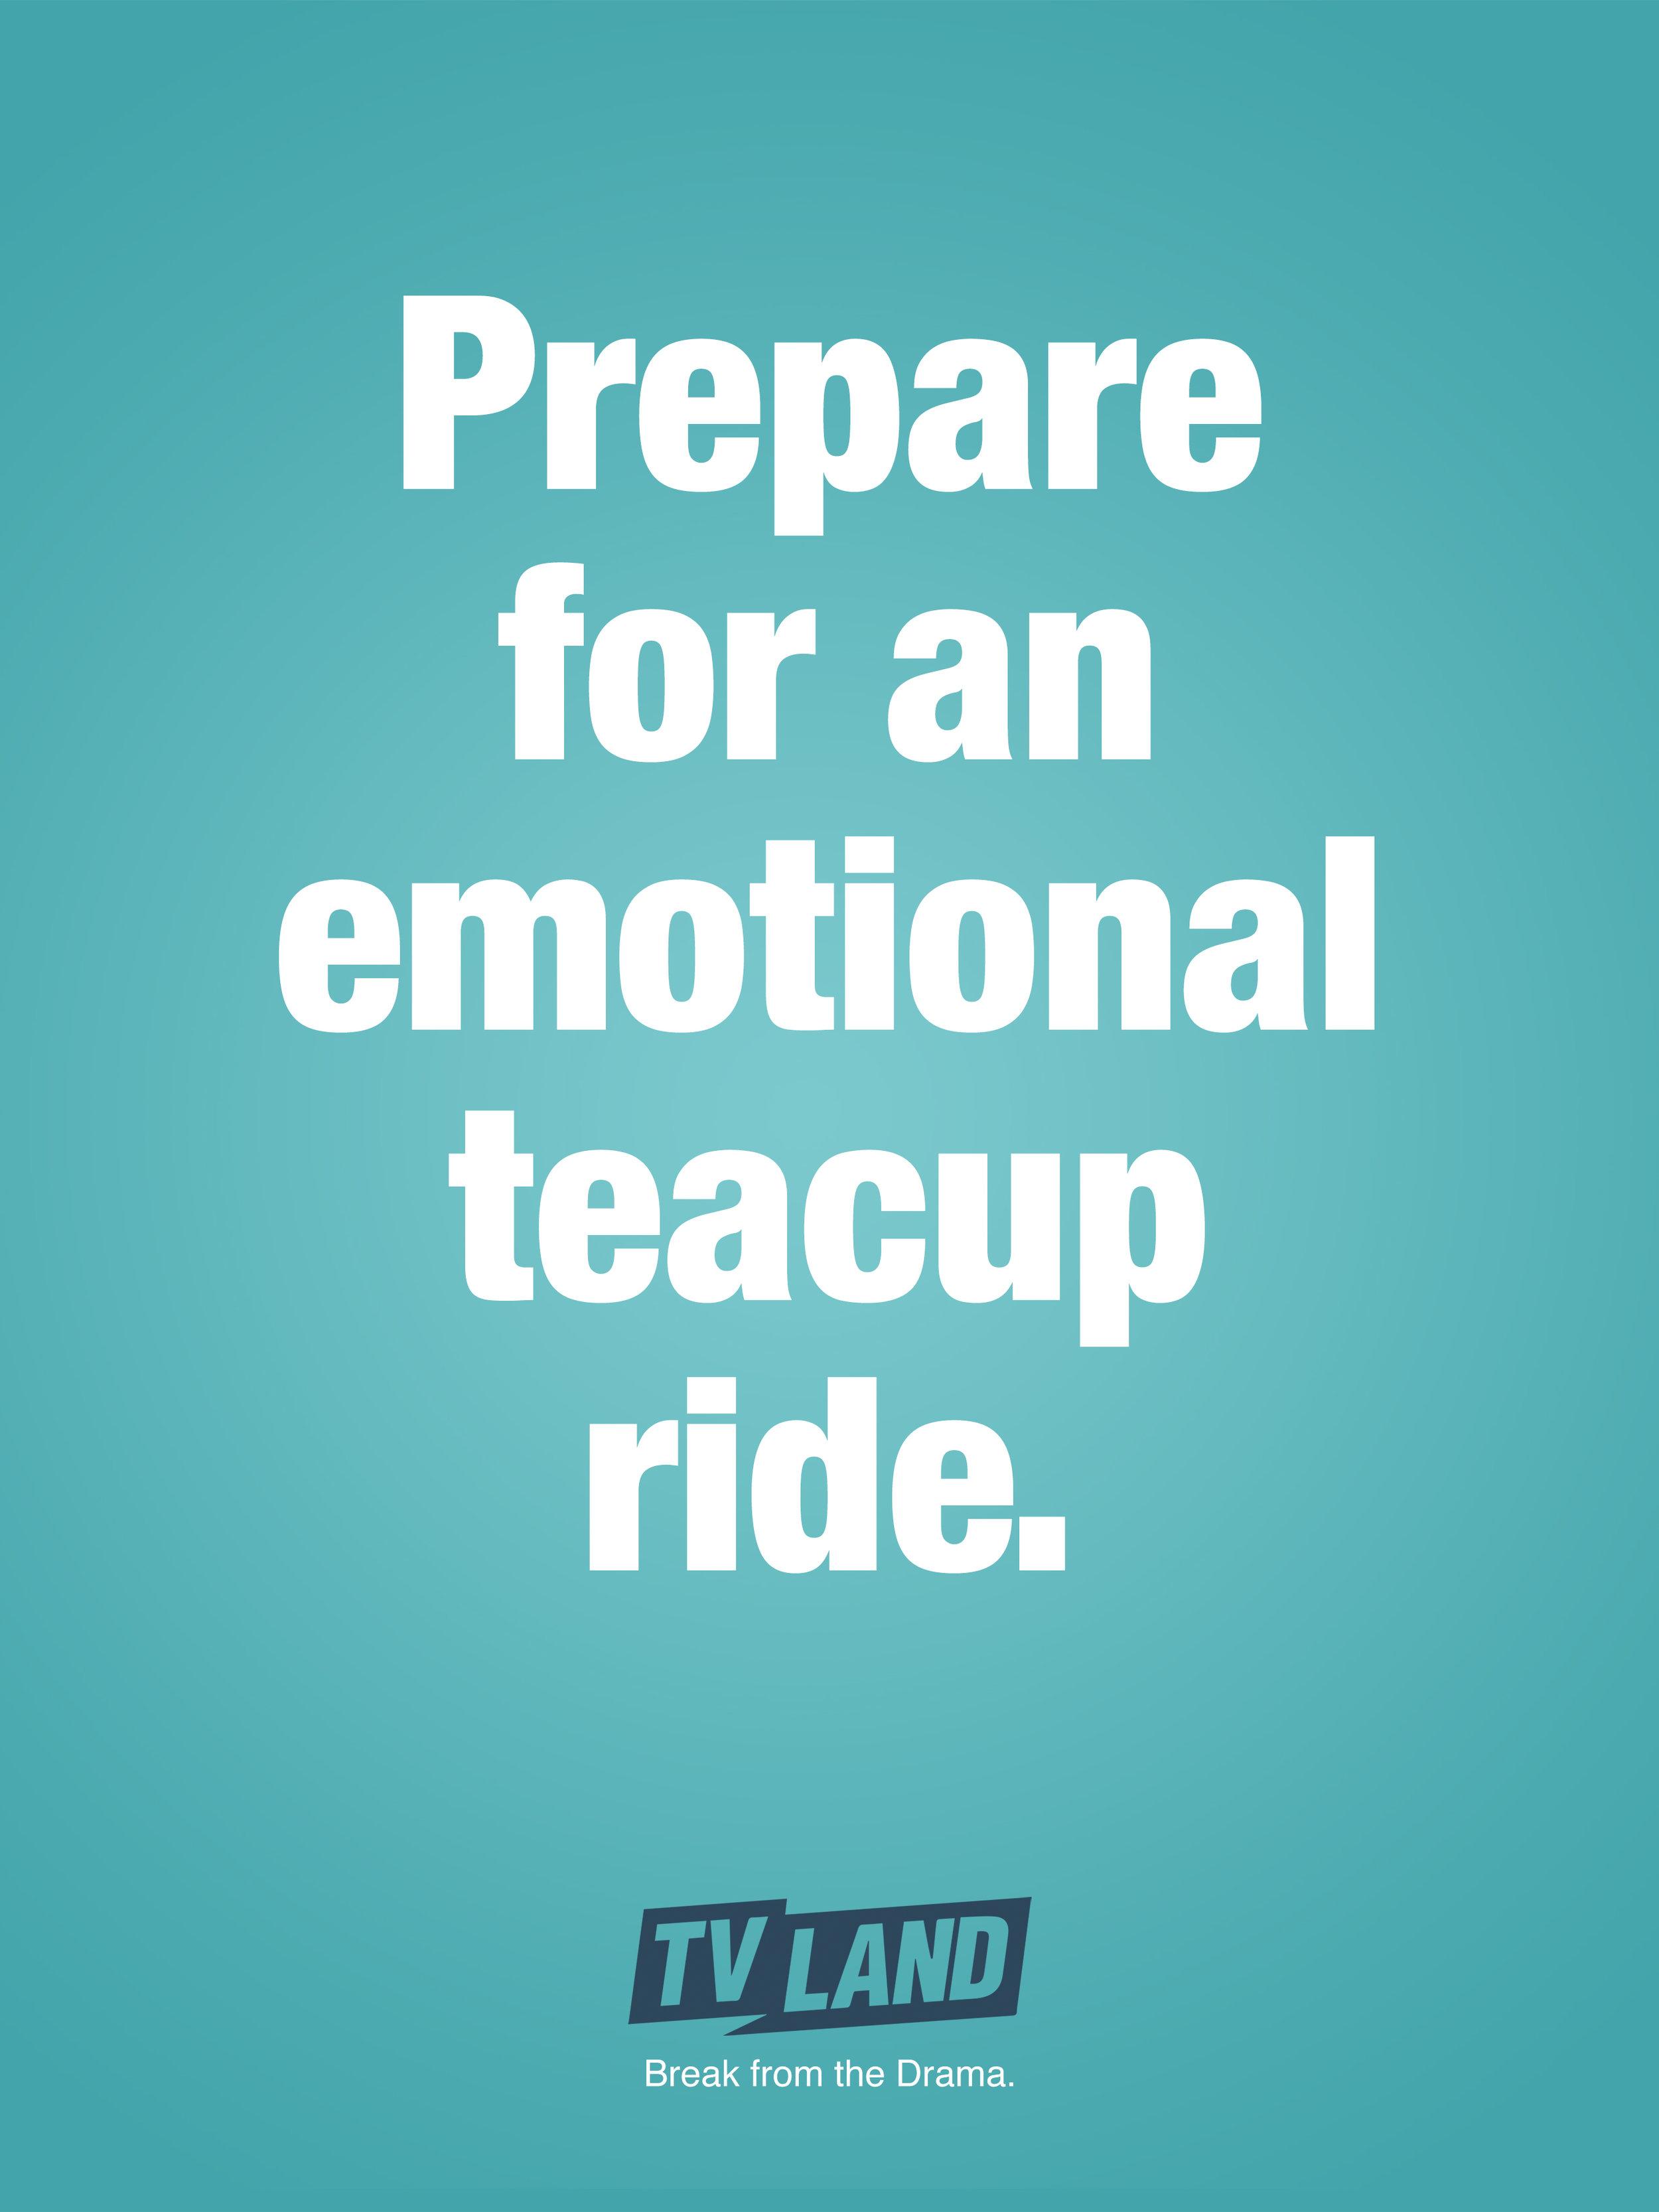 Print-Teacups.jpg